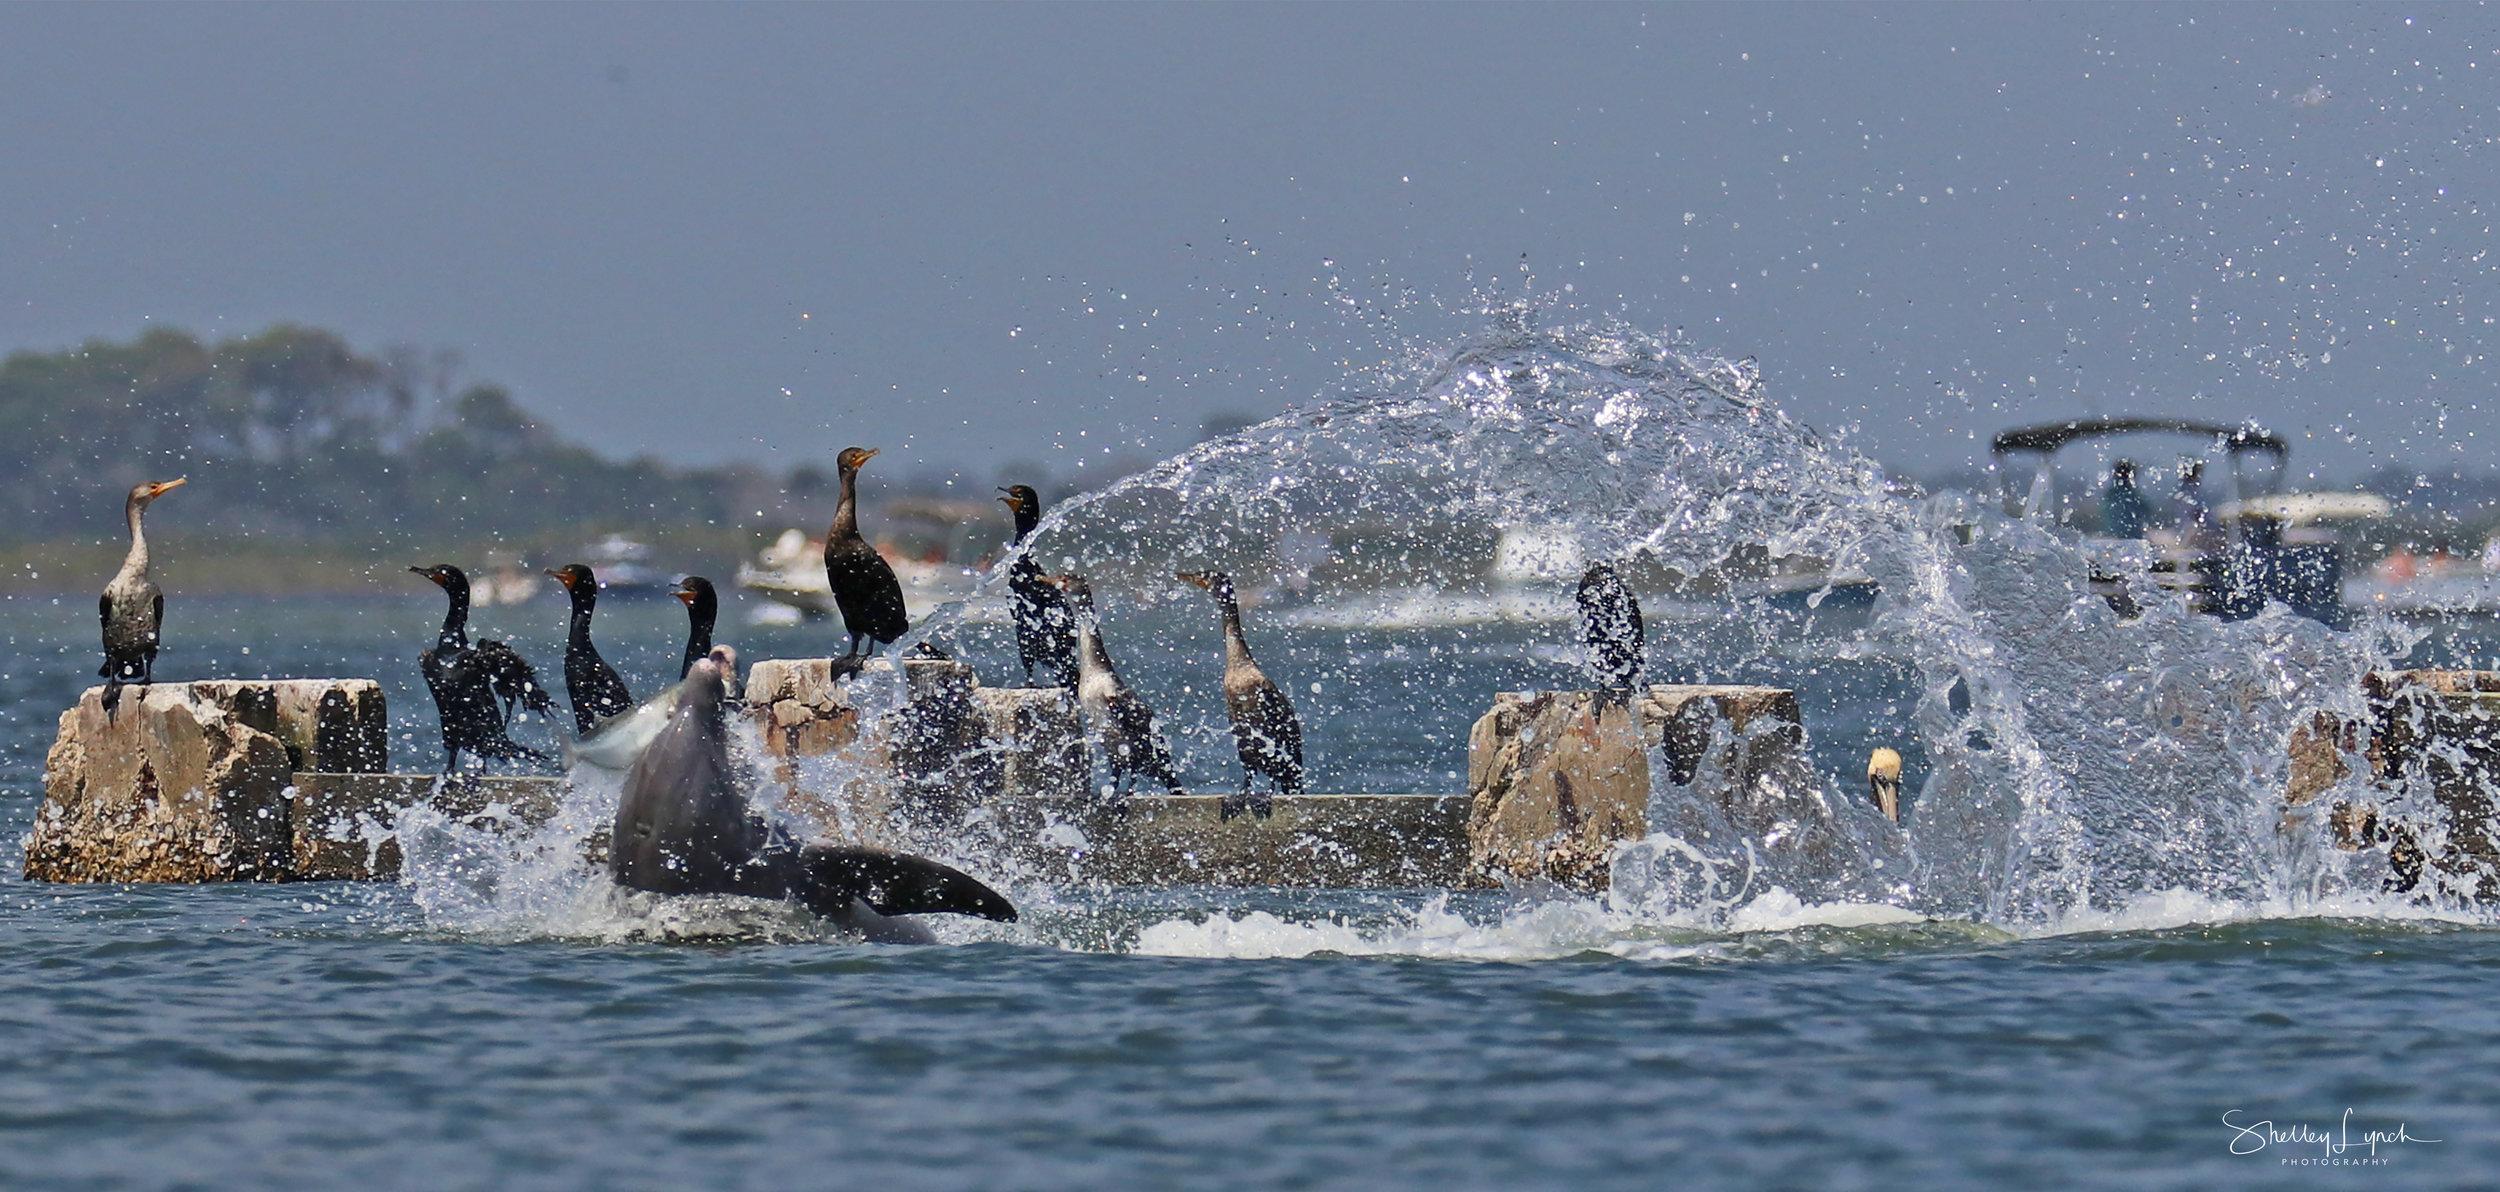 Cormorants hanging in the splash zone.